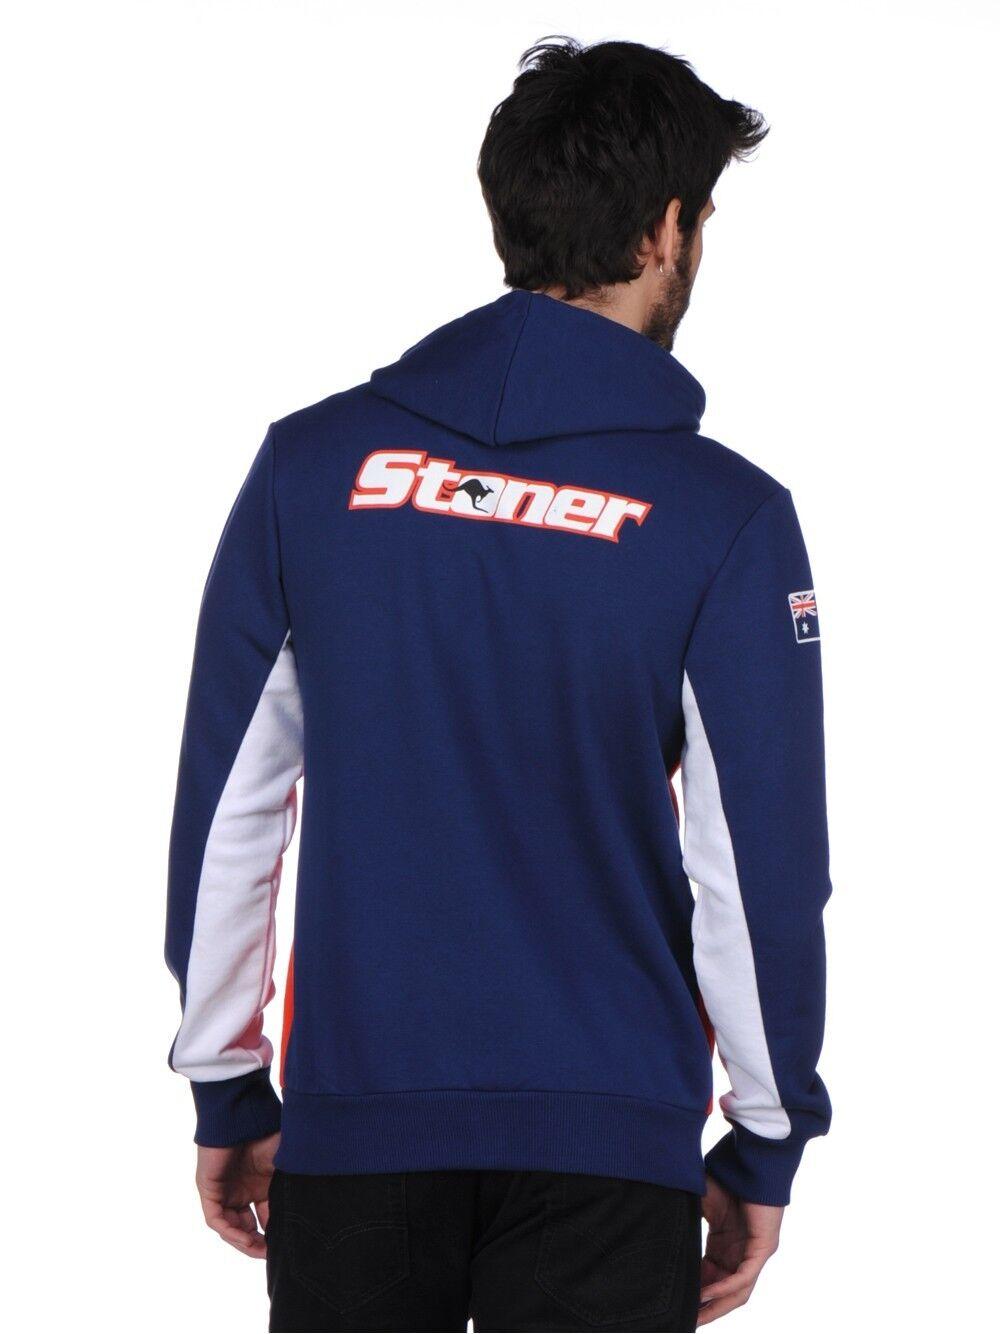 Ufficiale Casey Stoner Felpa con Cerniera - 17 17 17 24501 de1031